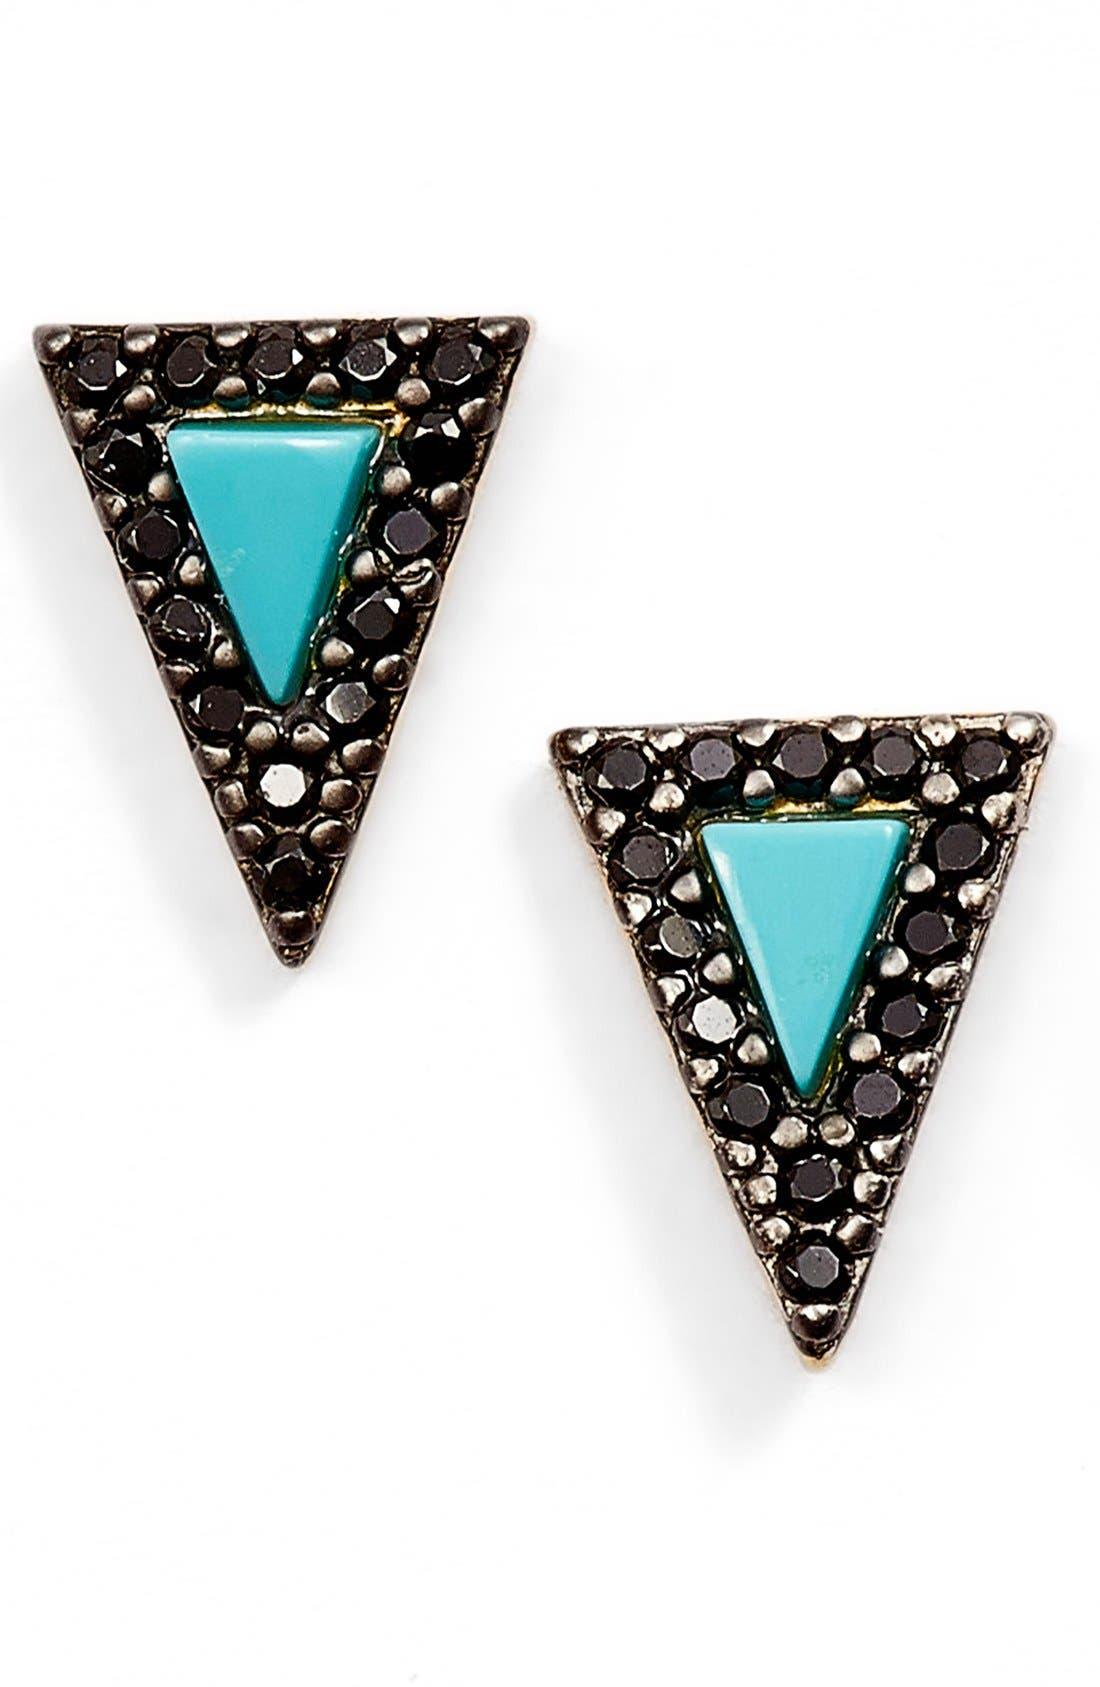 Alternate Image 1 Selected - FREIDA ROTHMAN 'Metropolitan' Triangle Stud Earrings (Online Only)